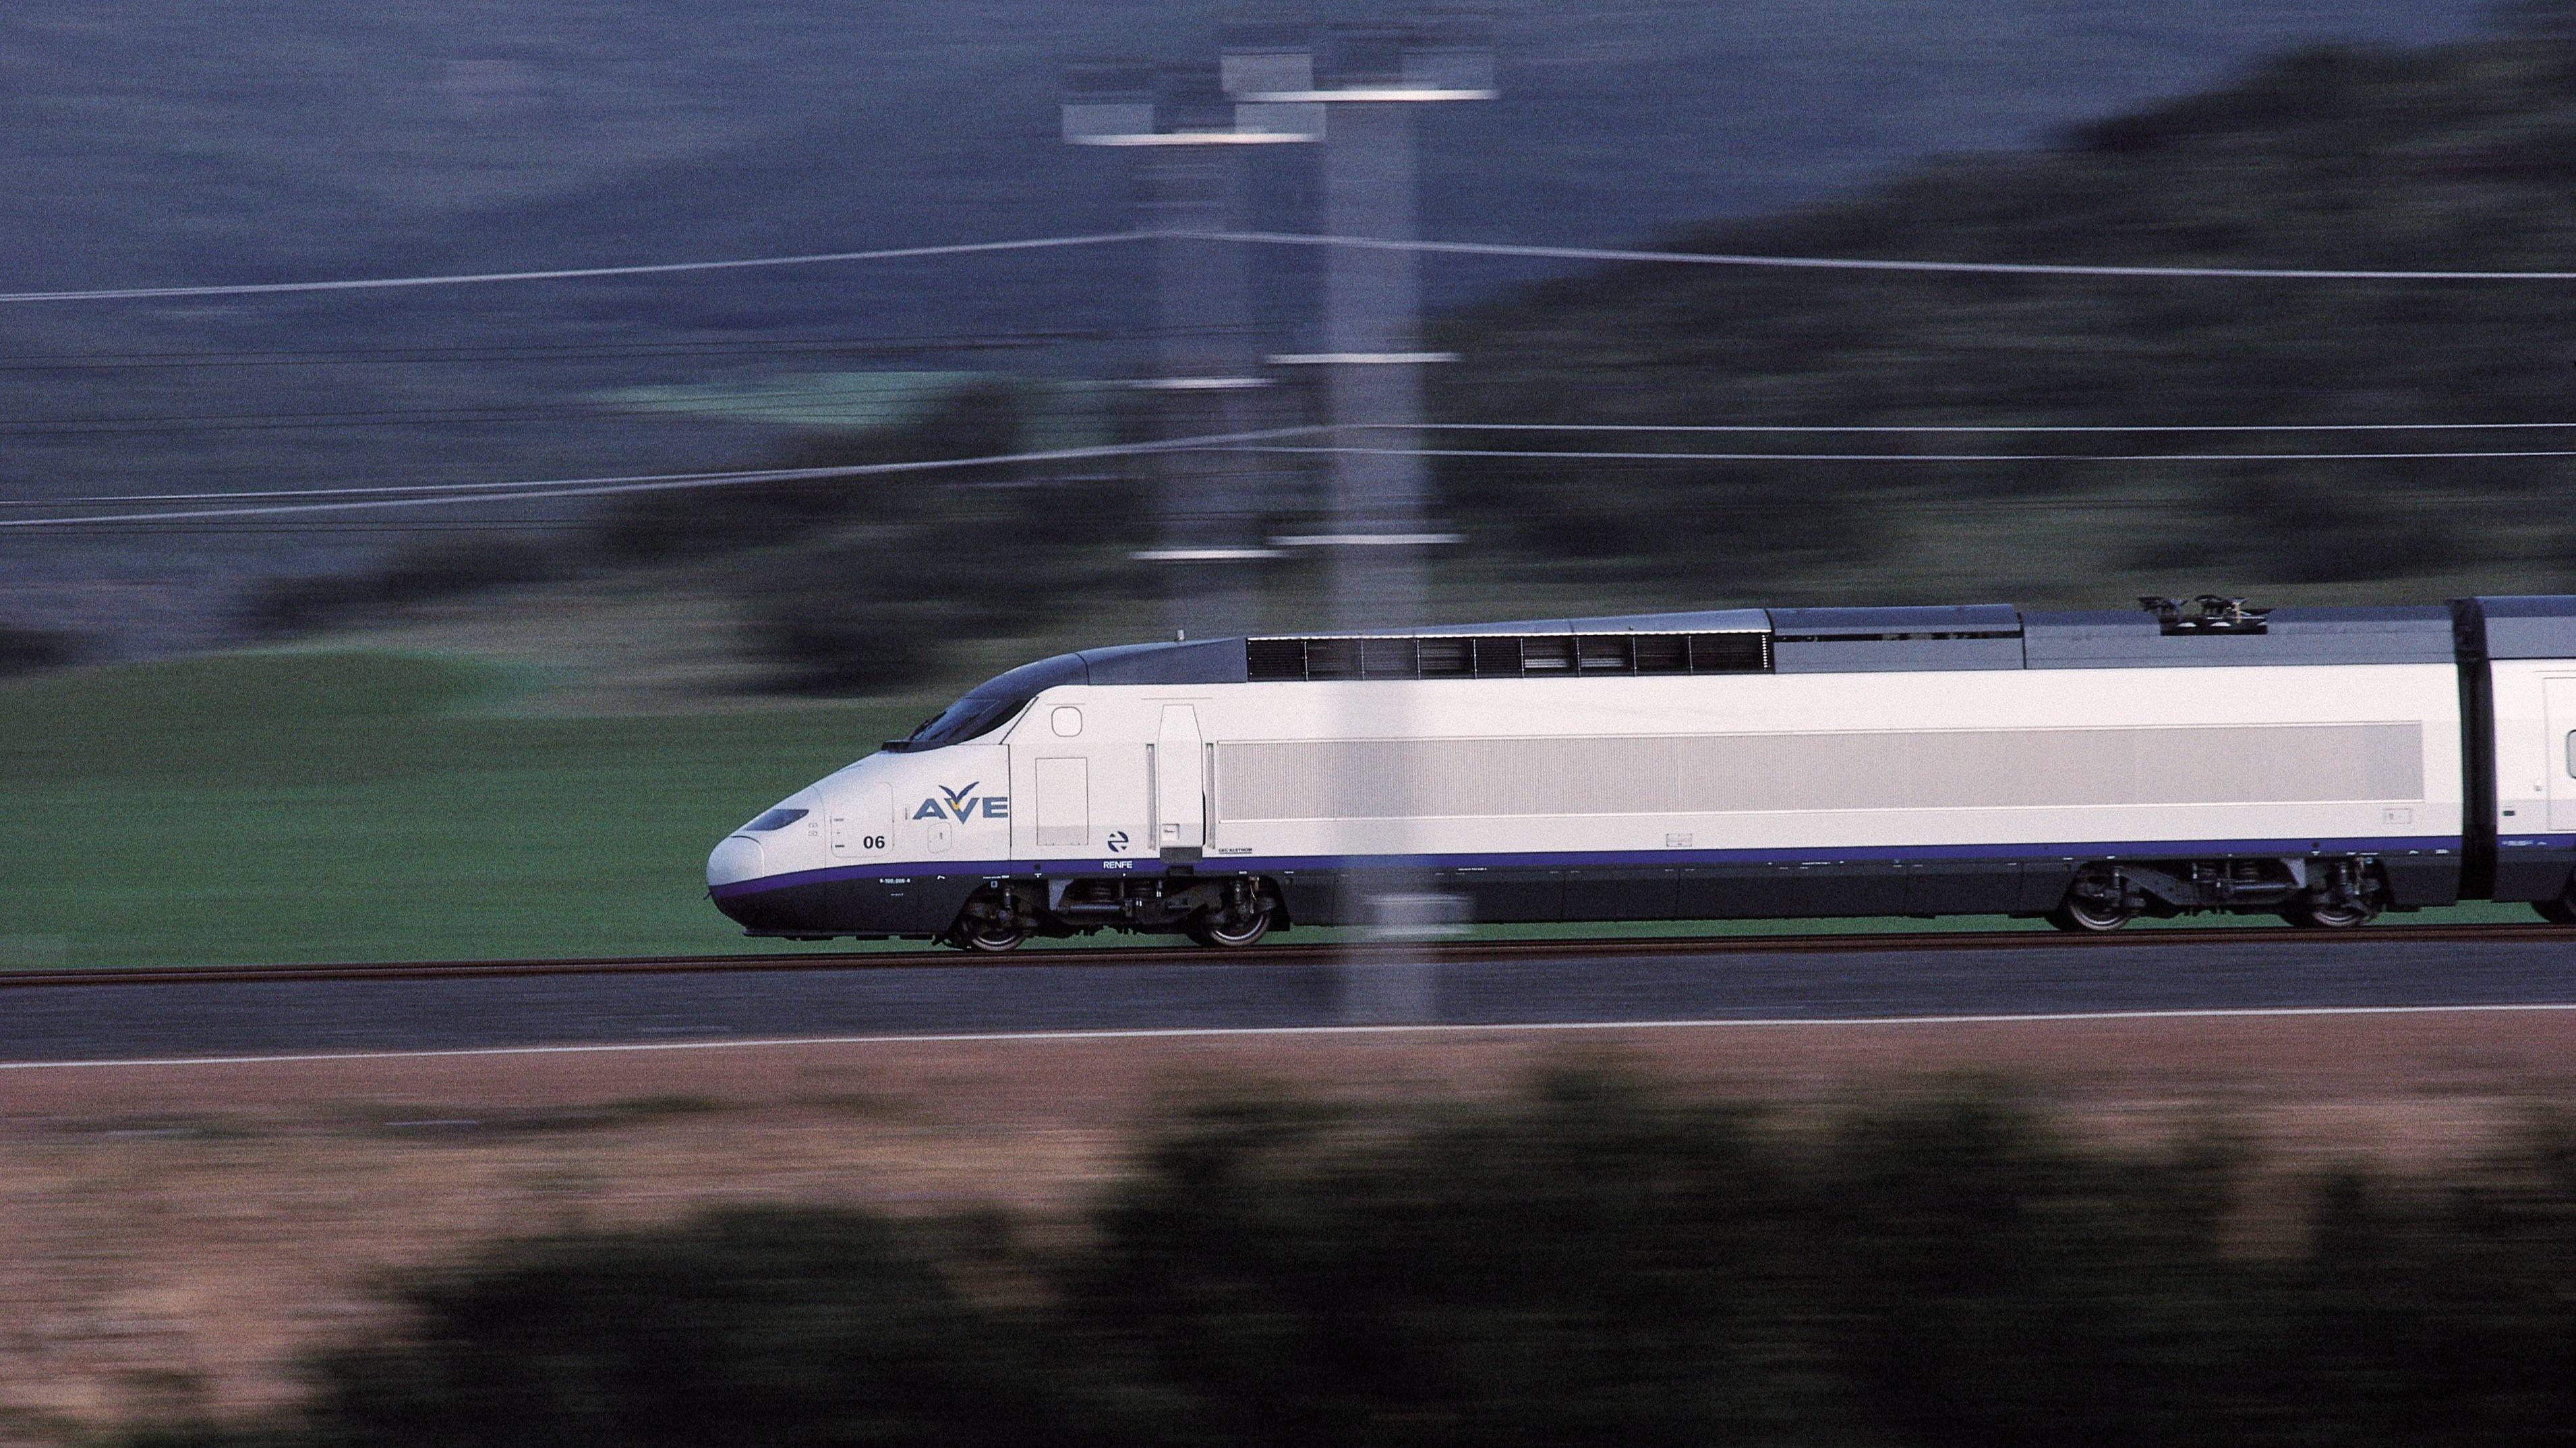 AVE, high-speed train AVE, high-speed train, circulating for a railroad